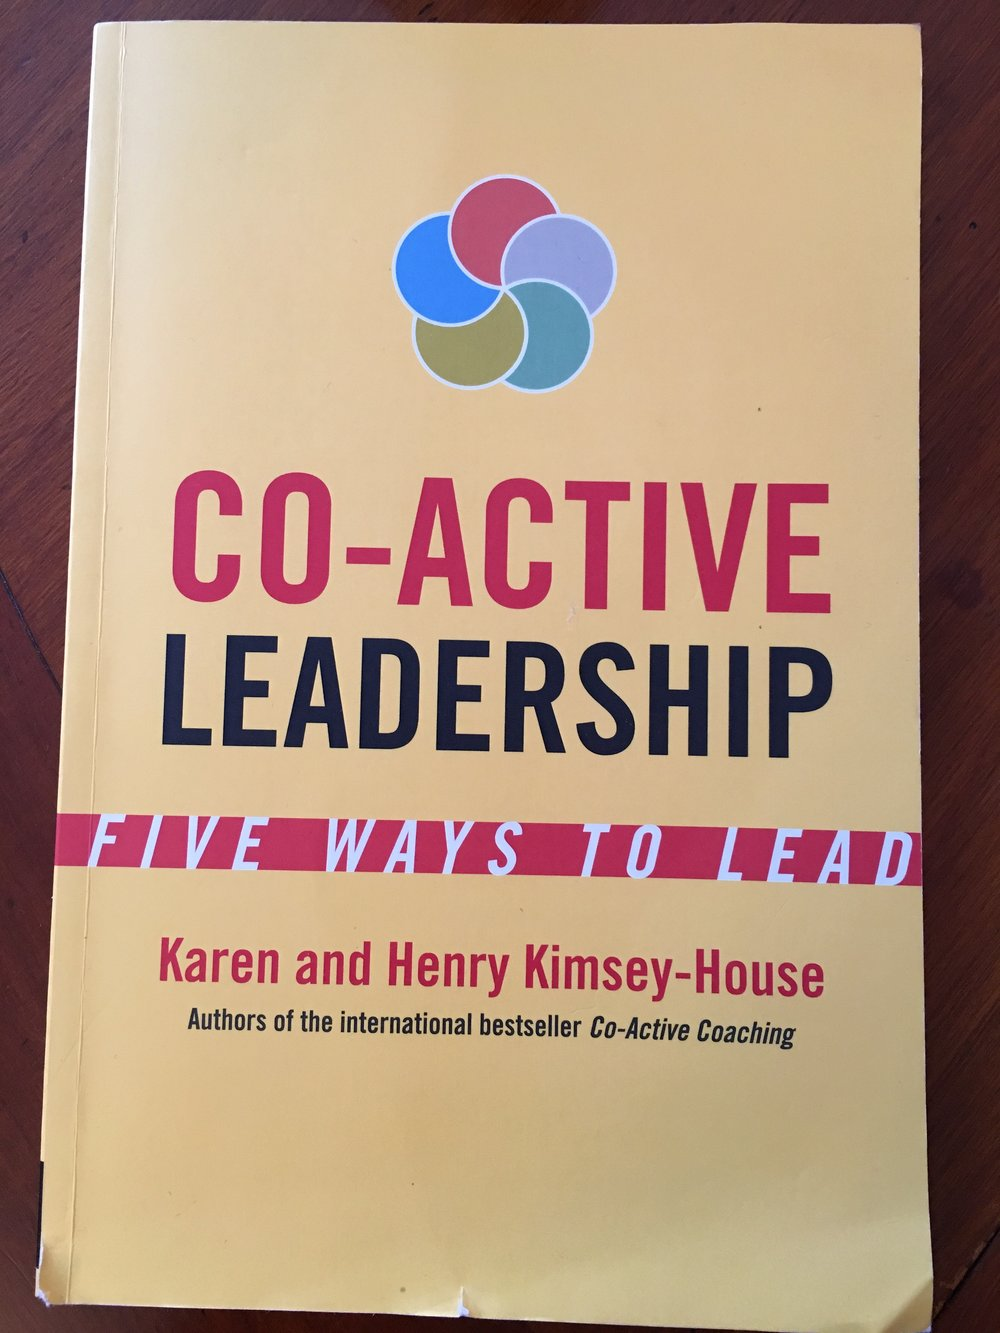 Co-active Leadership.jpg